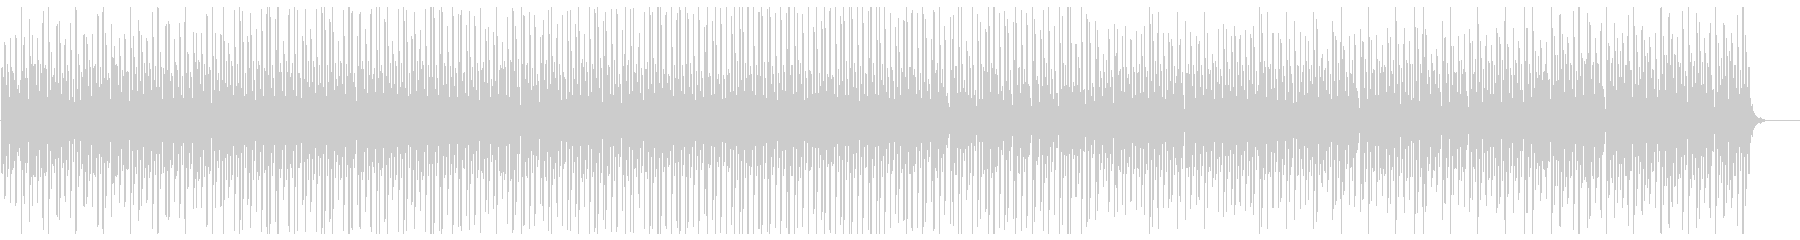 Rhythmic piano instruments's unreproduced waveform